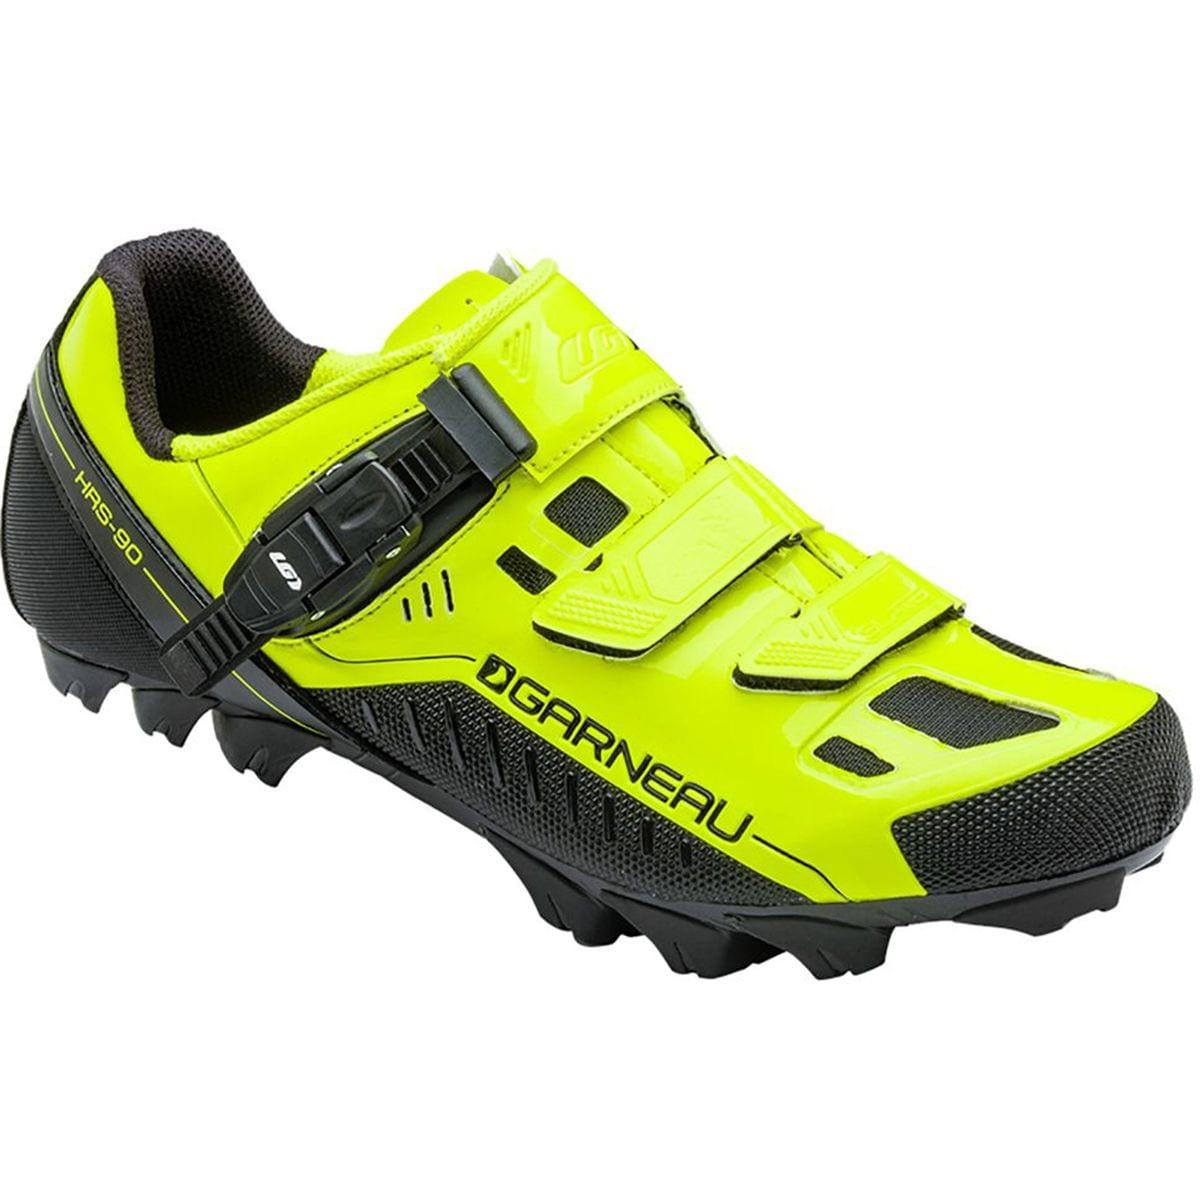 Louis Garneau Slate Mountain Bike Shoe